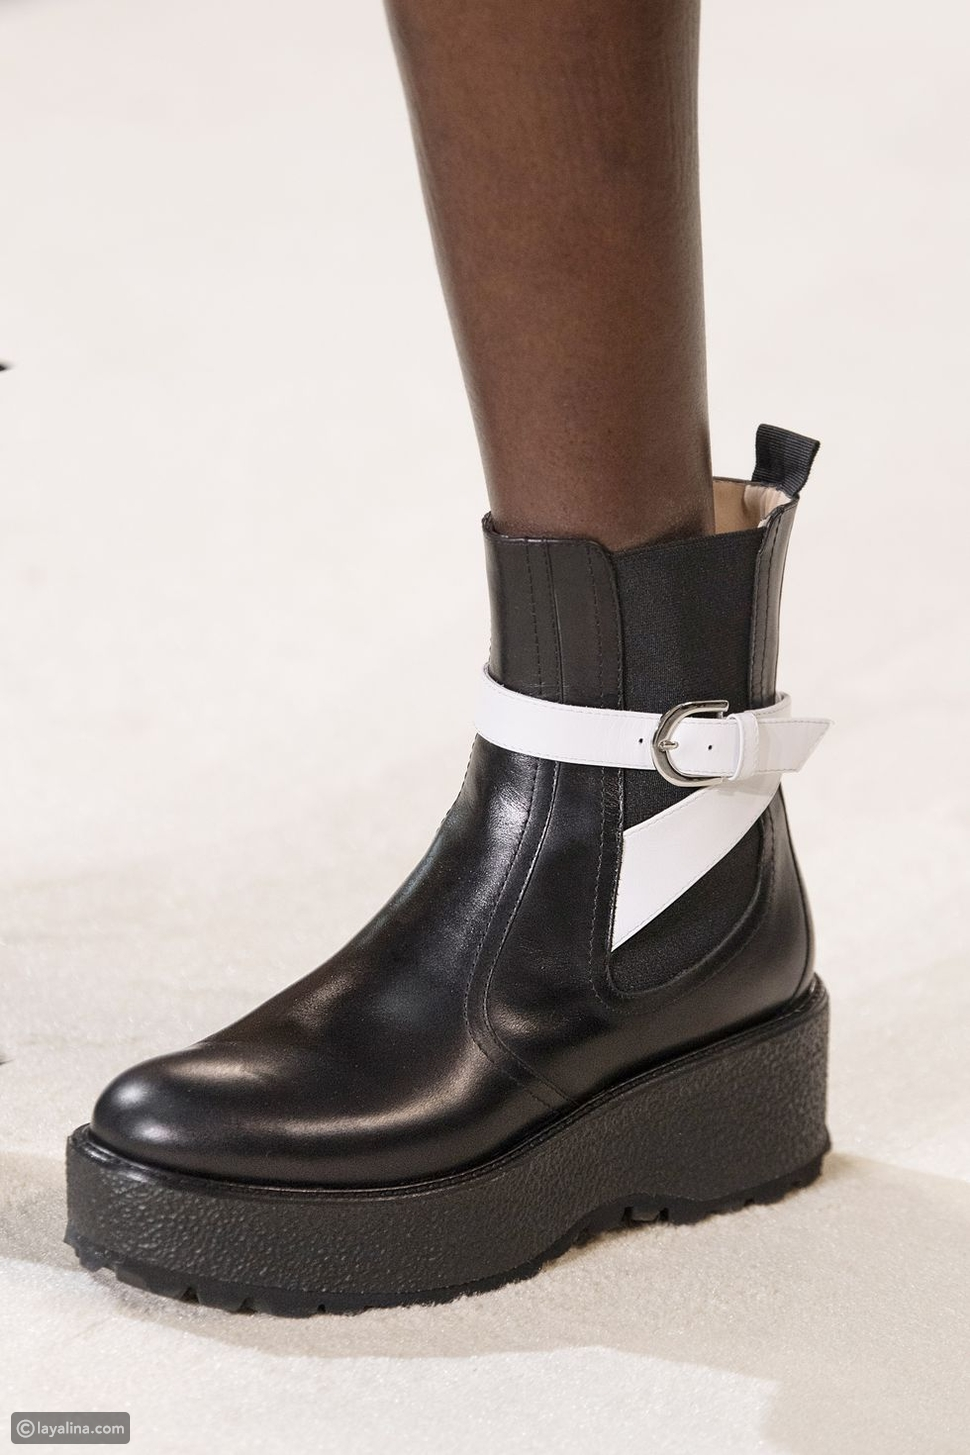 حذاء تشيلسي سميك